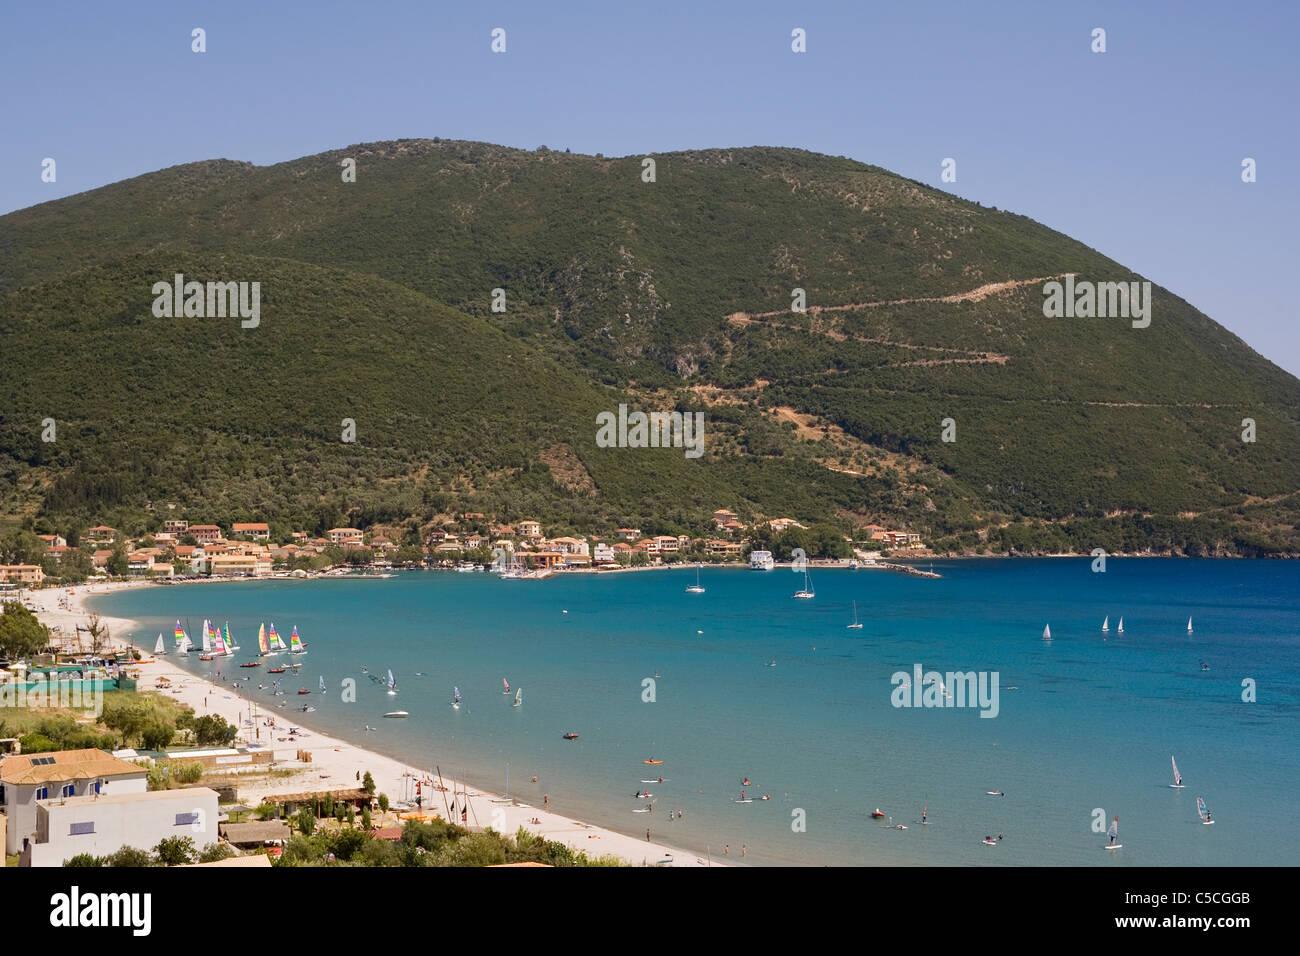 Greece Ionian islands Lefkada Vassiliki - Stock Image